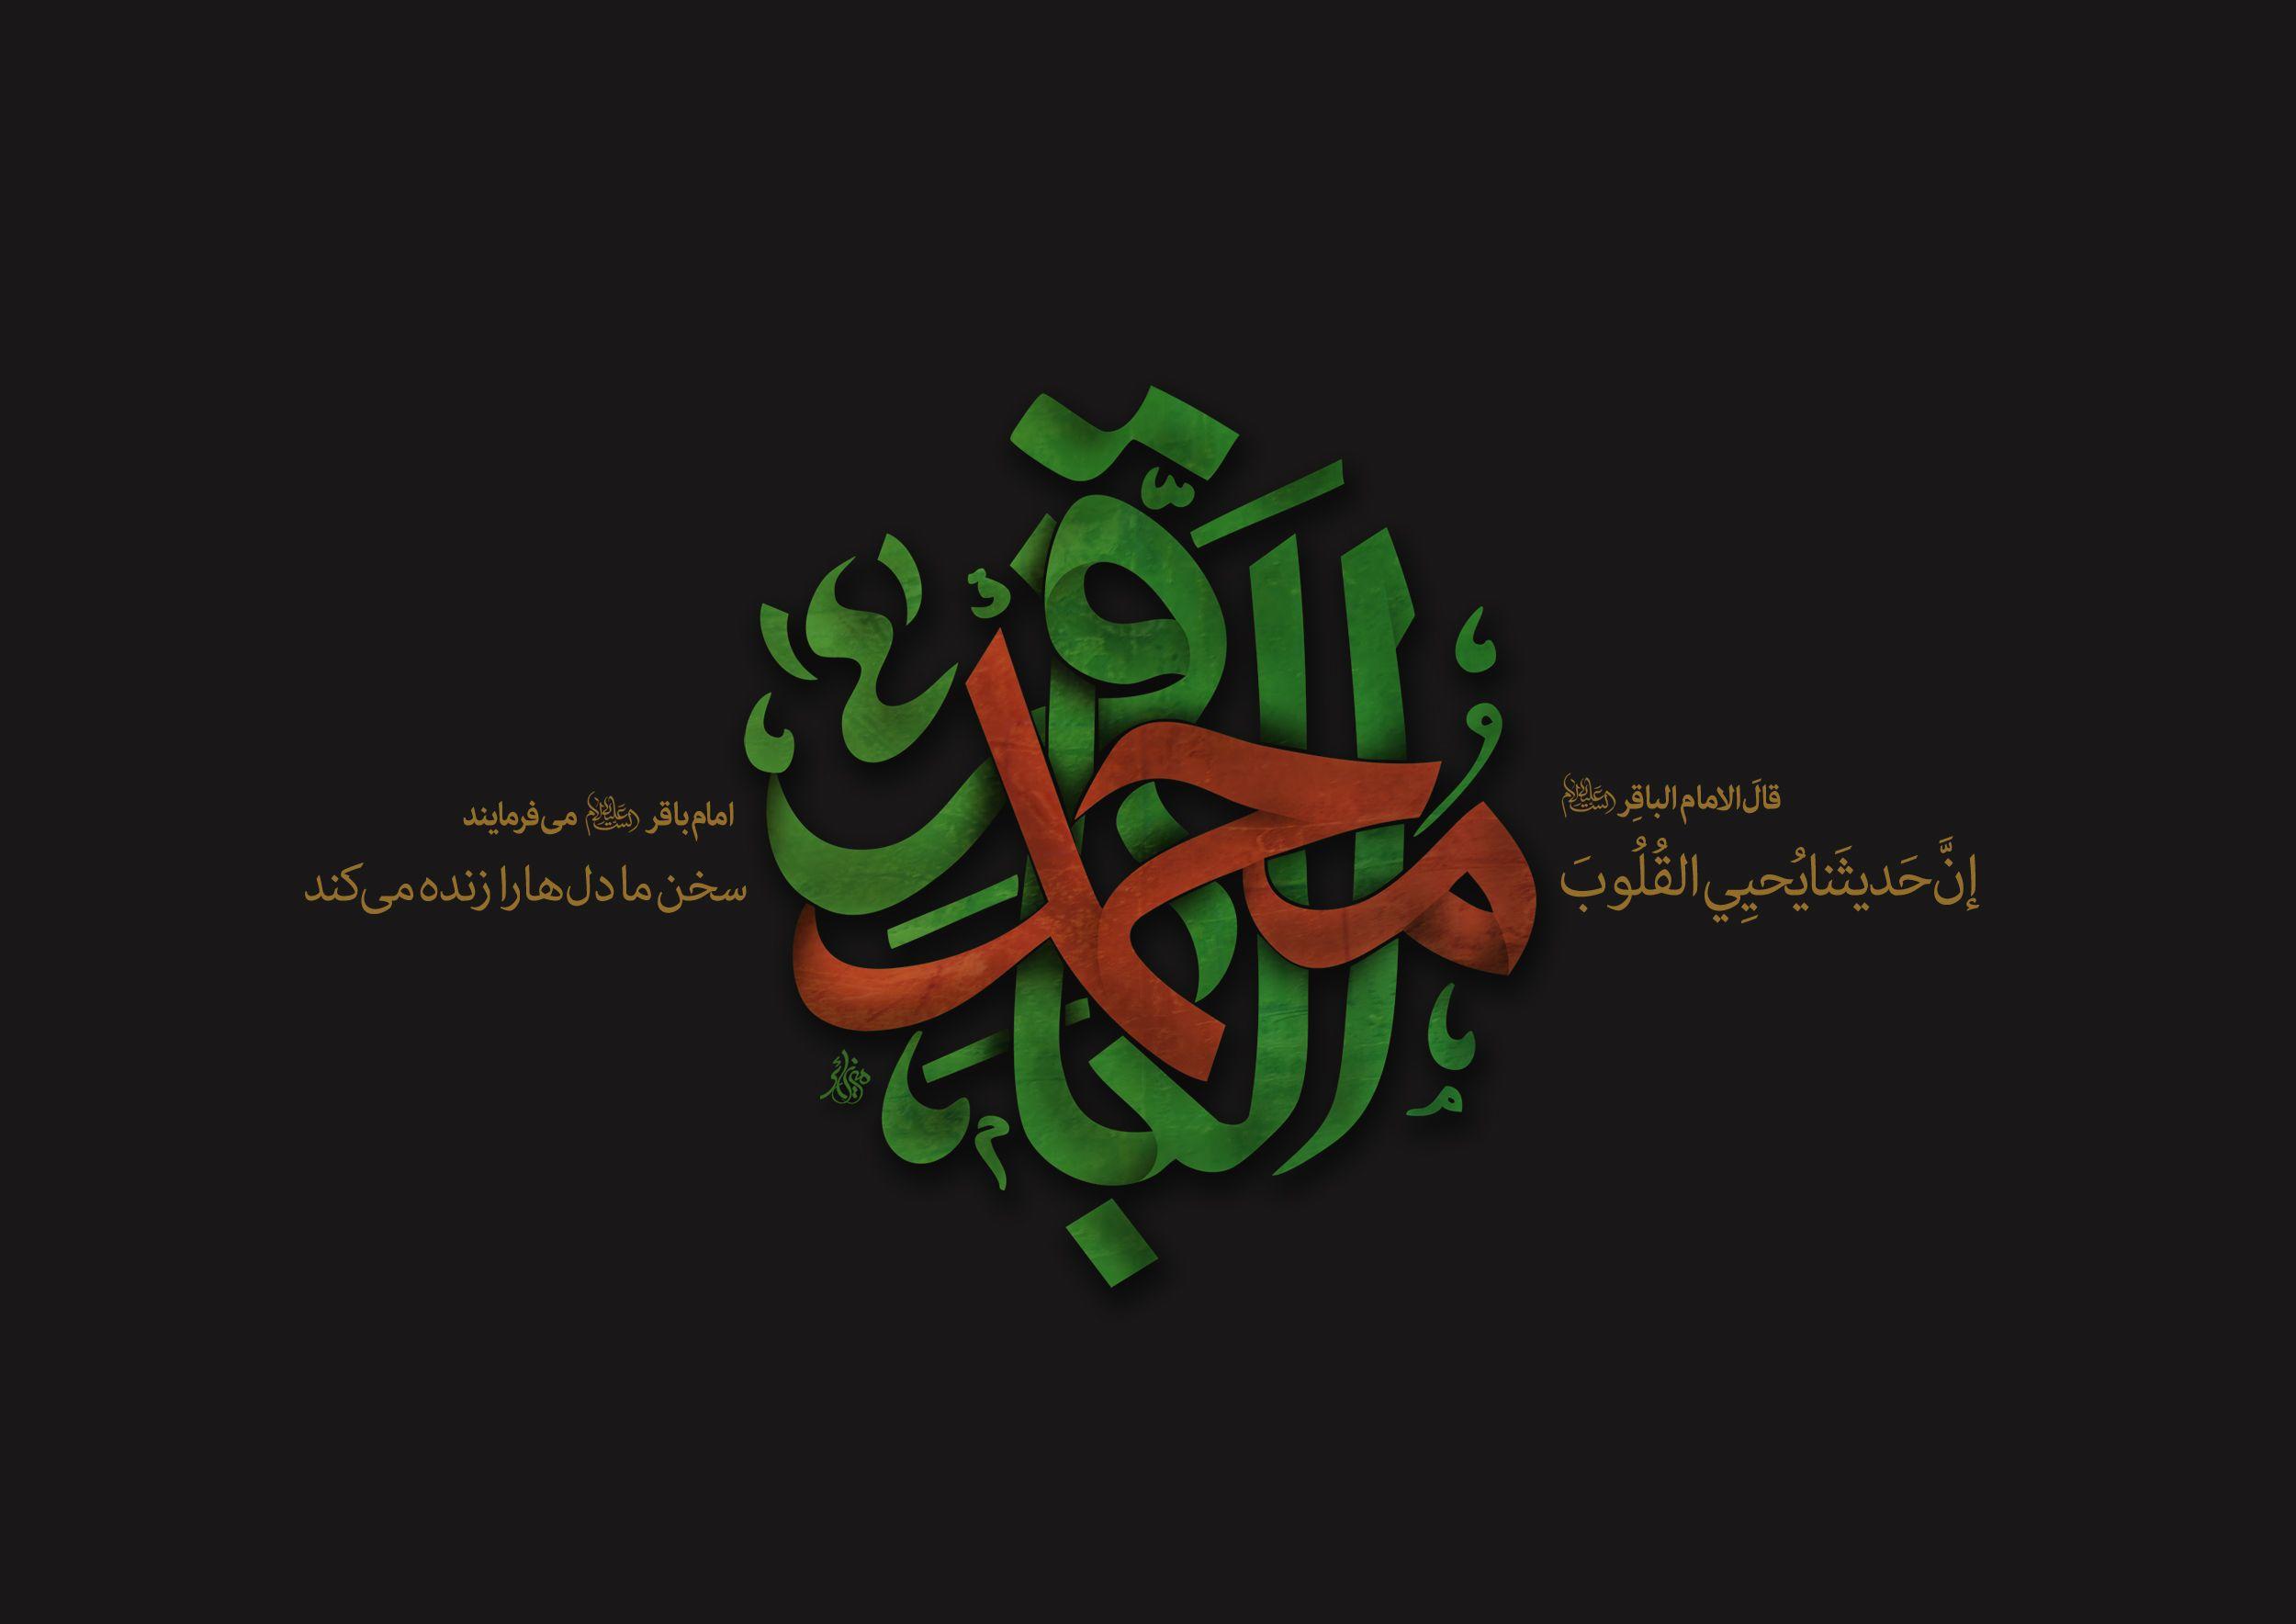 Mohammad Al Bagher امام محمد باقر Typography Ibn Ali Arabic